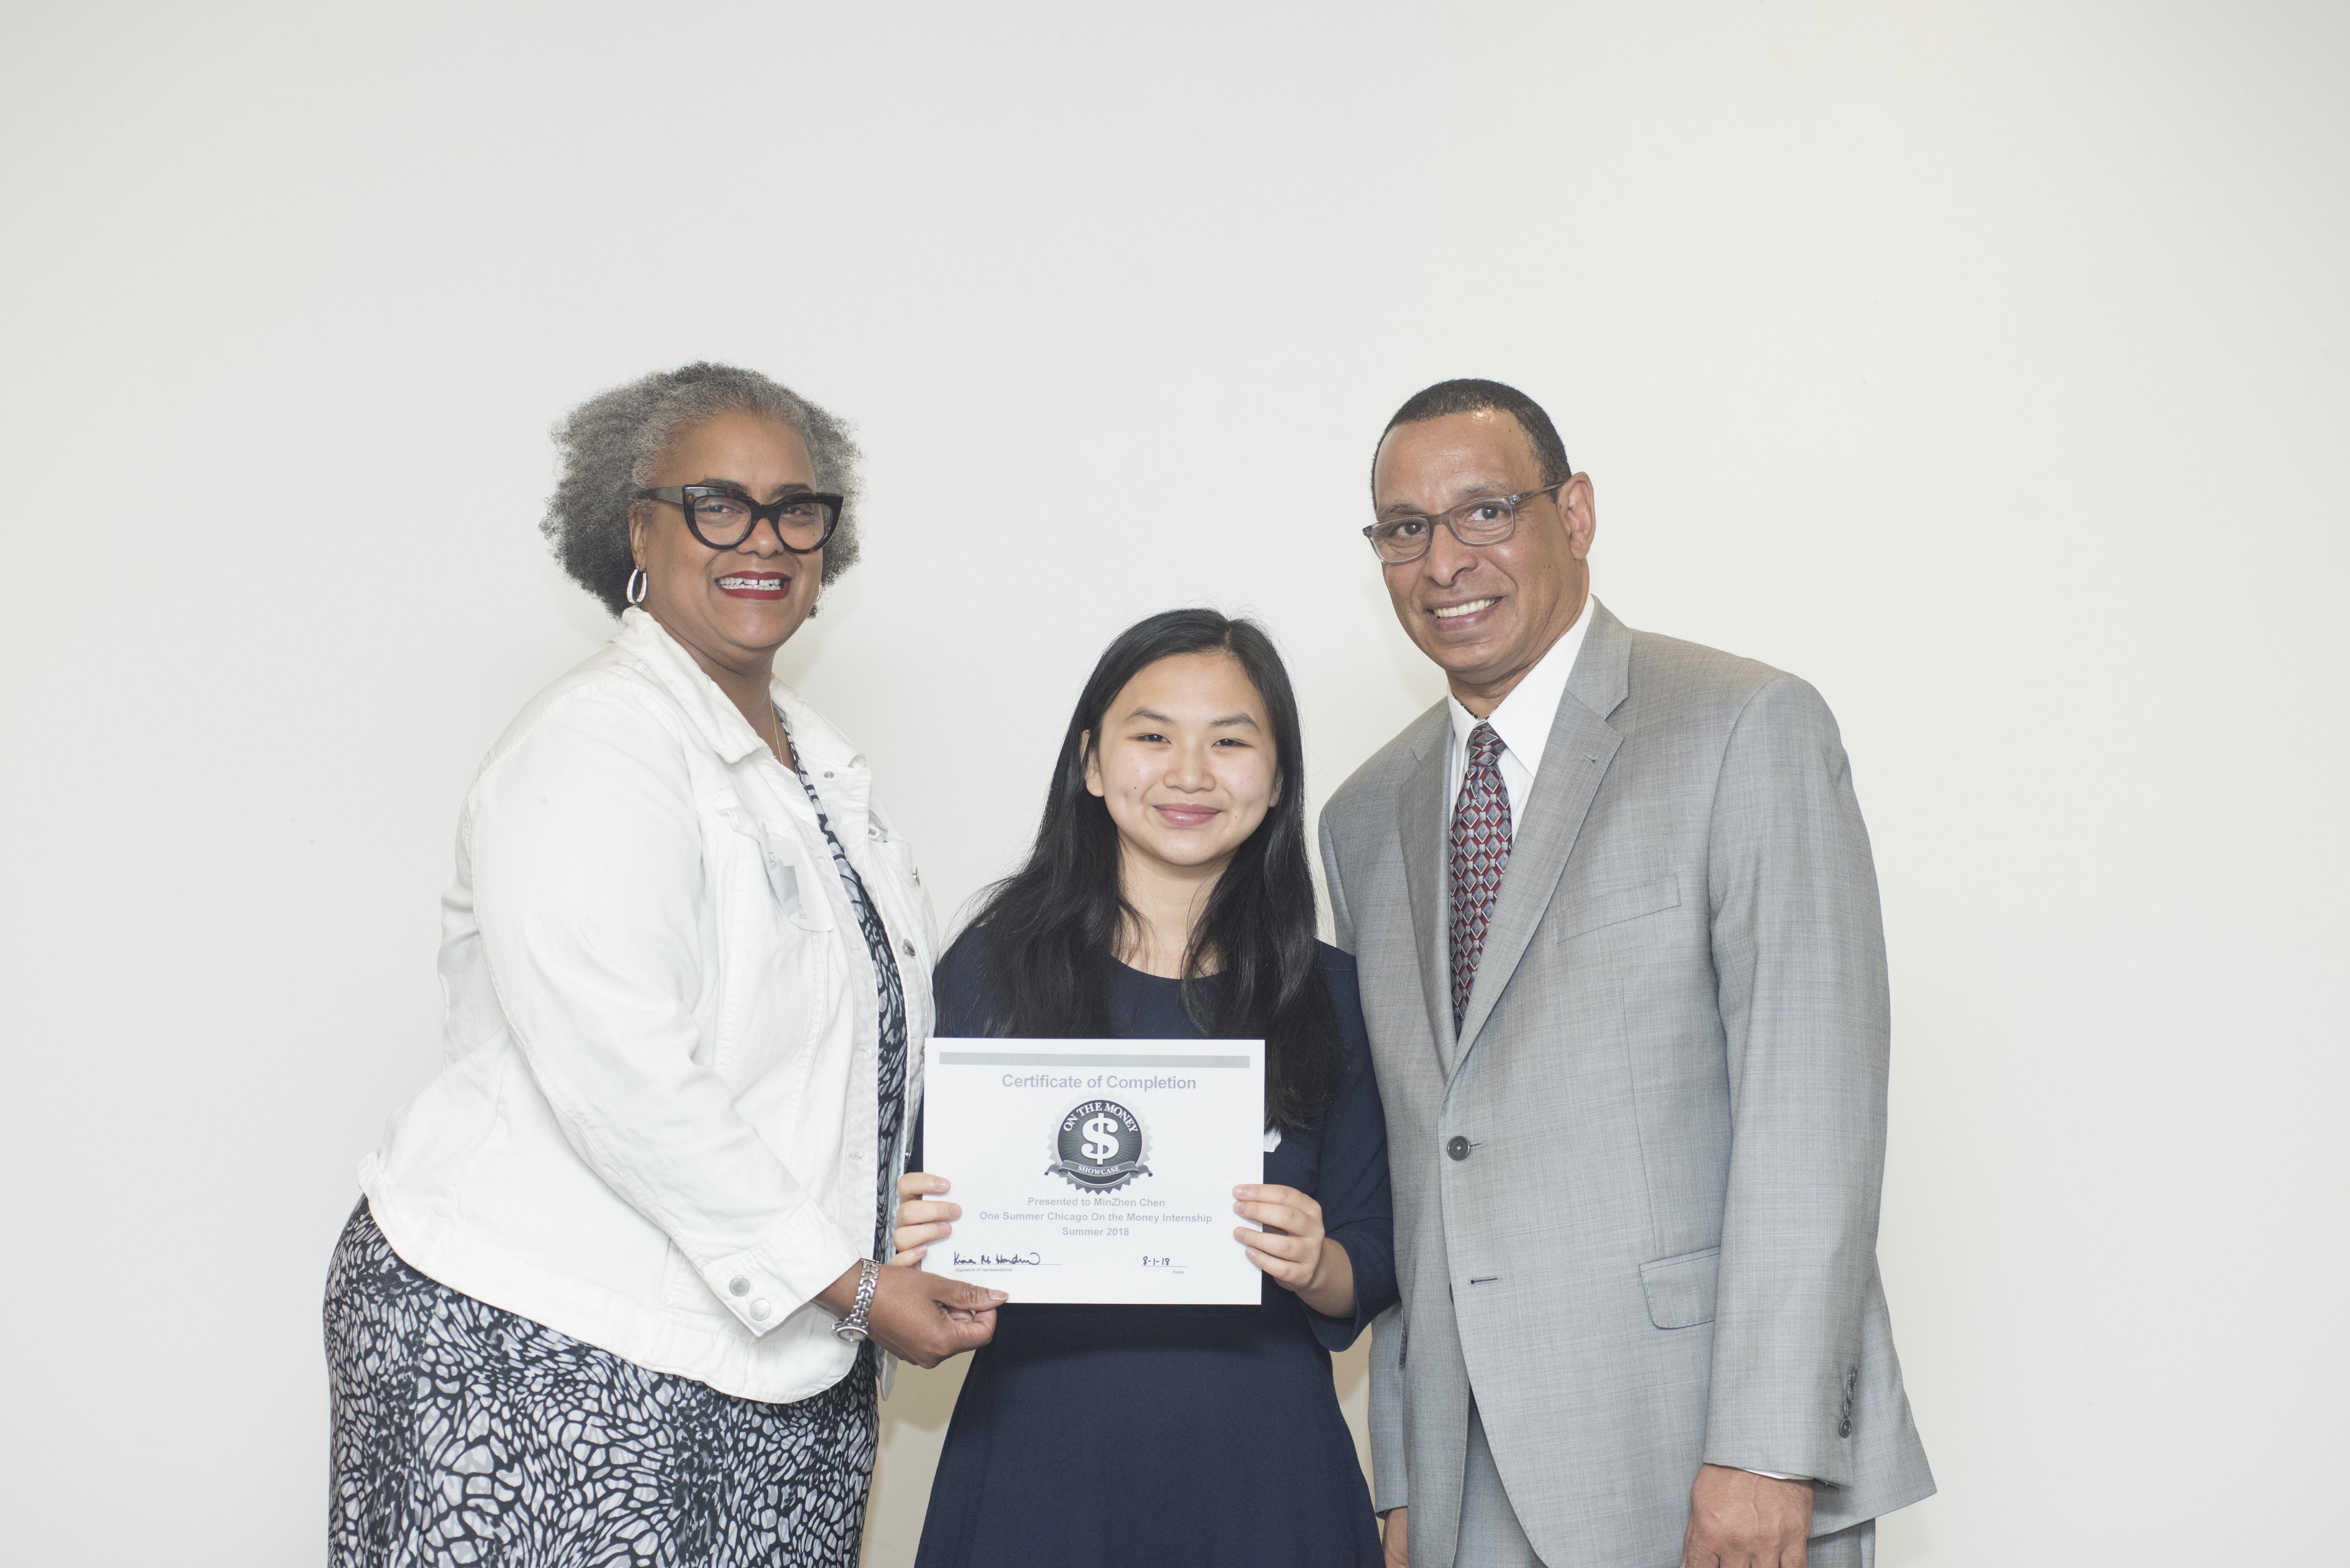 Certificate min zen